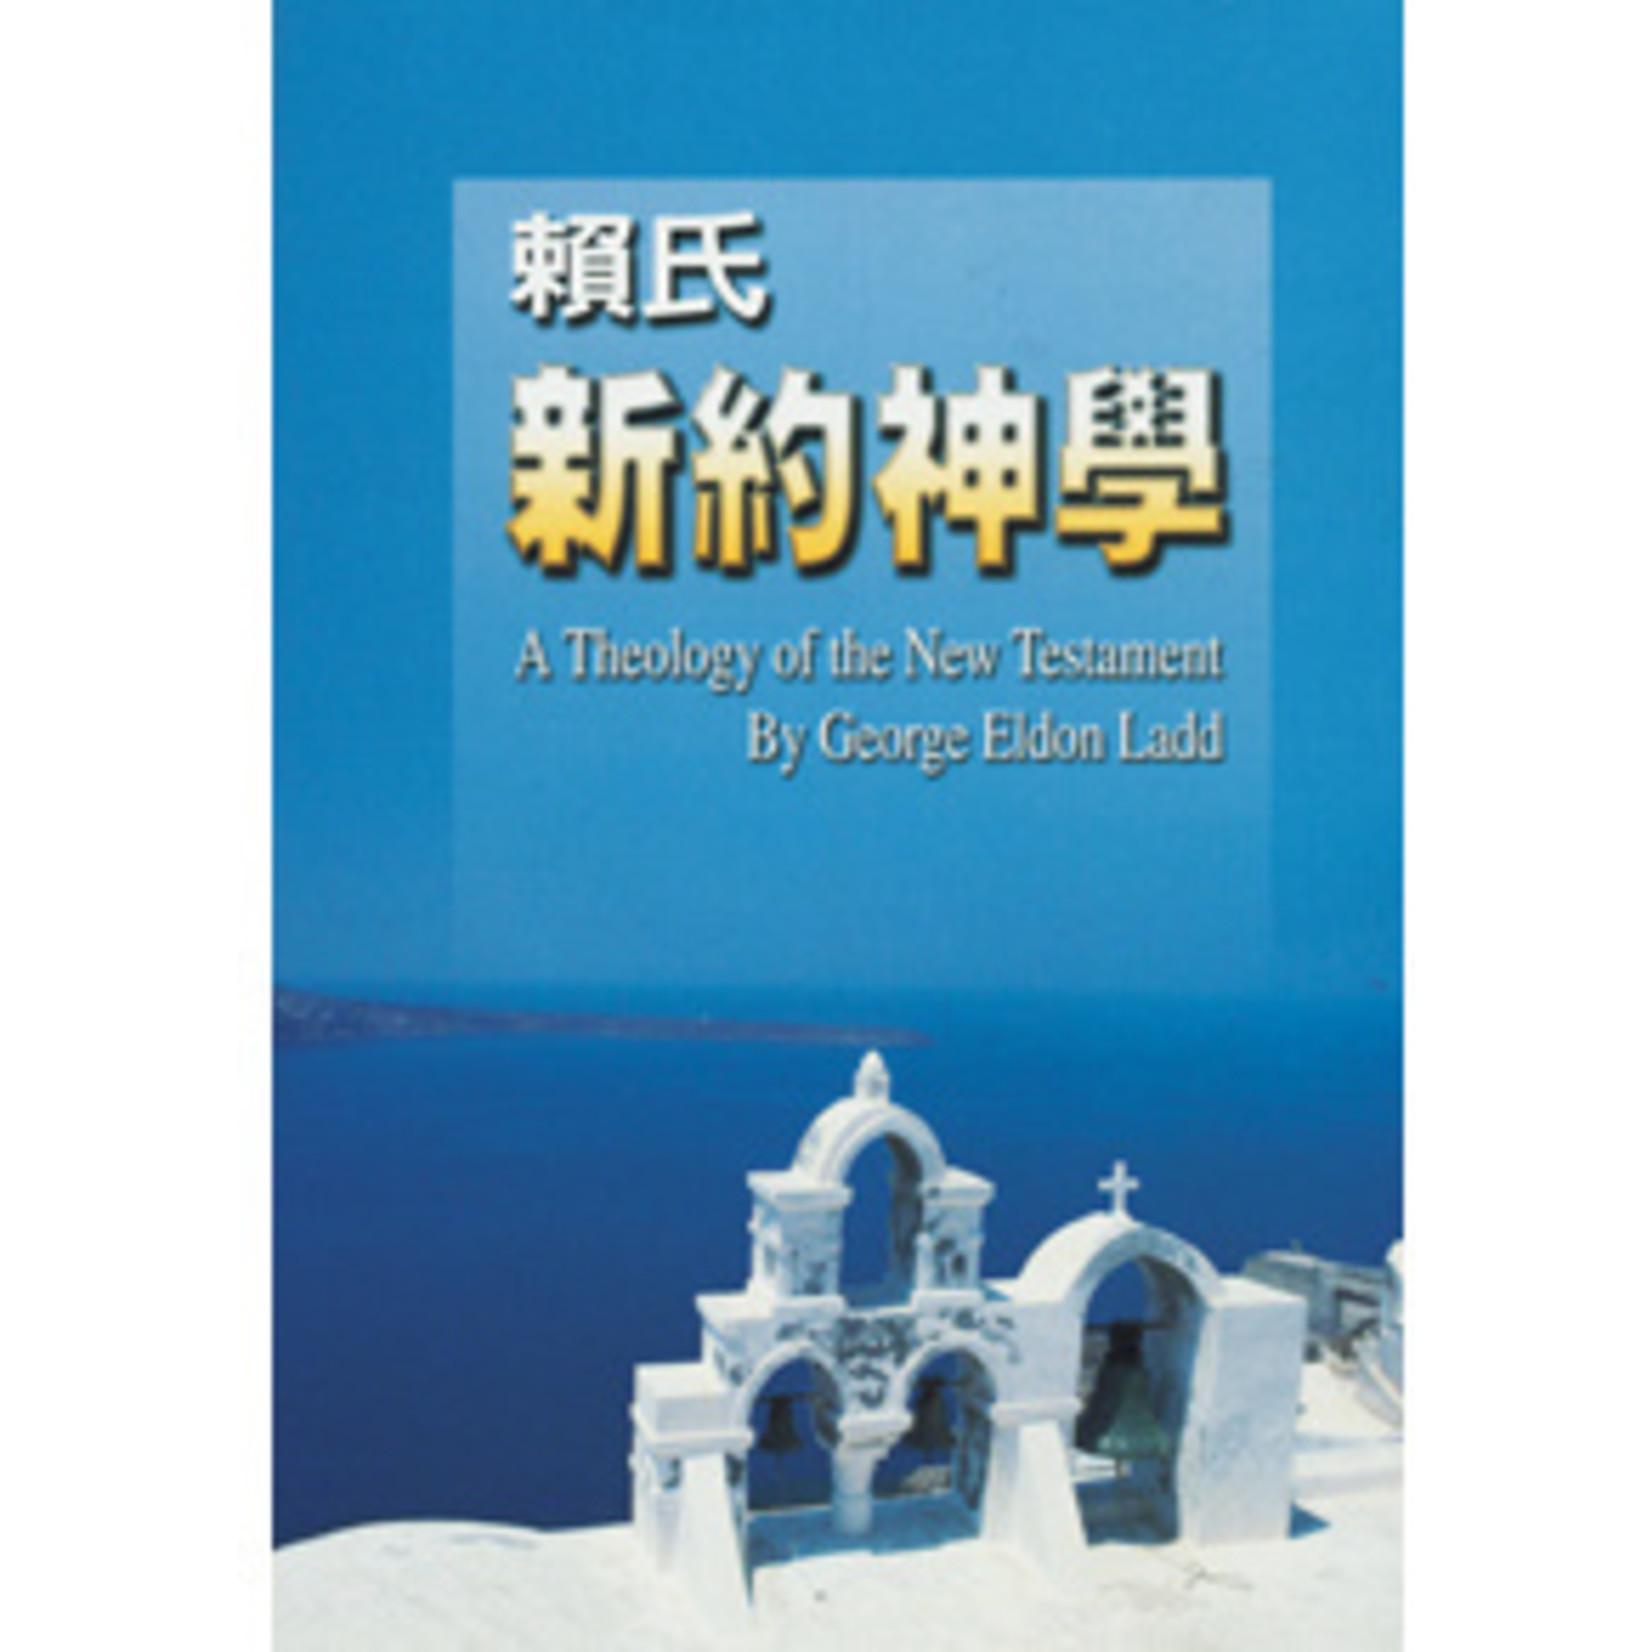 中華福音神學院 China Evangelical Seminary 賴氏新約神學 A Theology of the New Testament